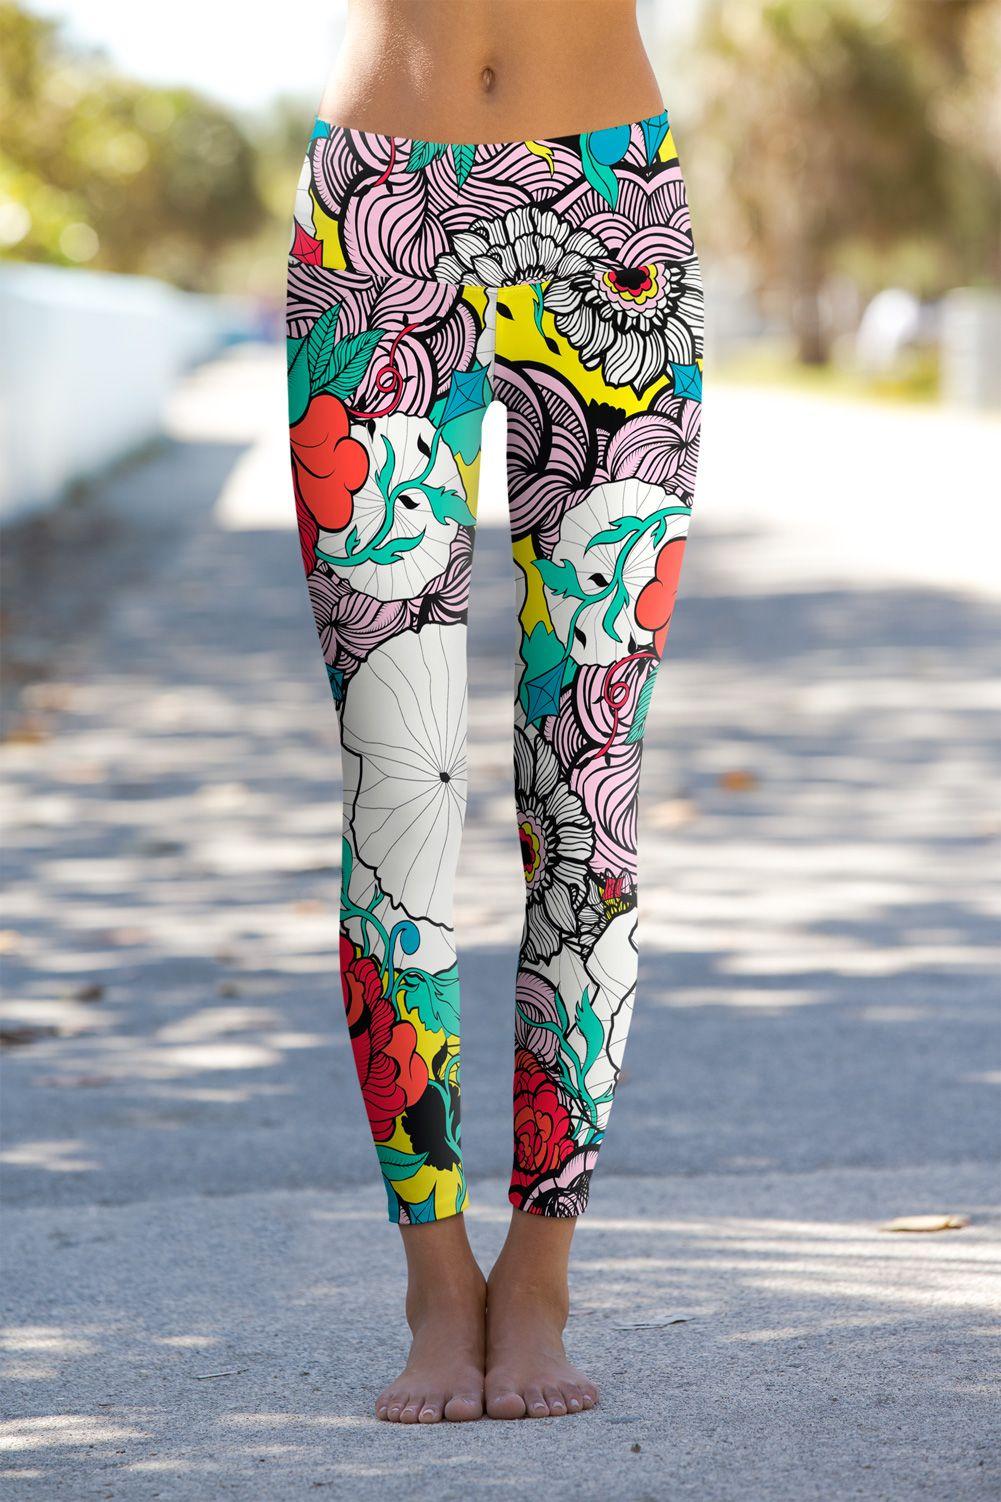 Irene Women Sport Pants Yoga Plus Size Workout Vintage Print Leggings Fitness Athletic